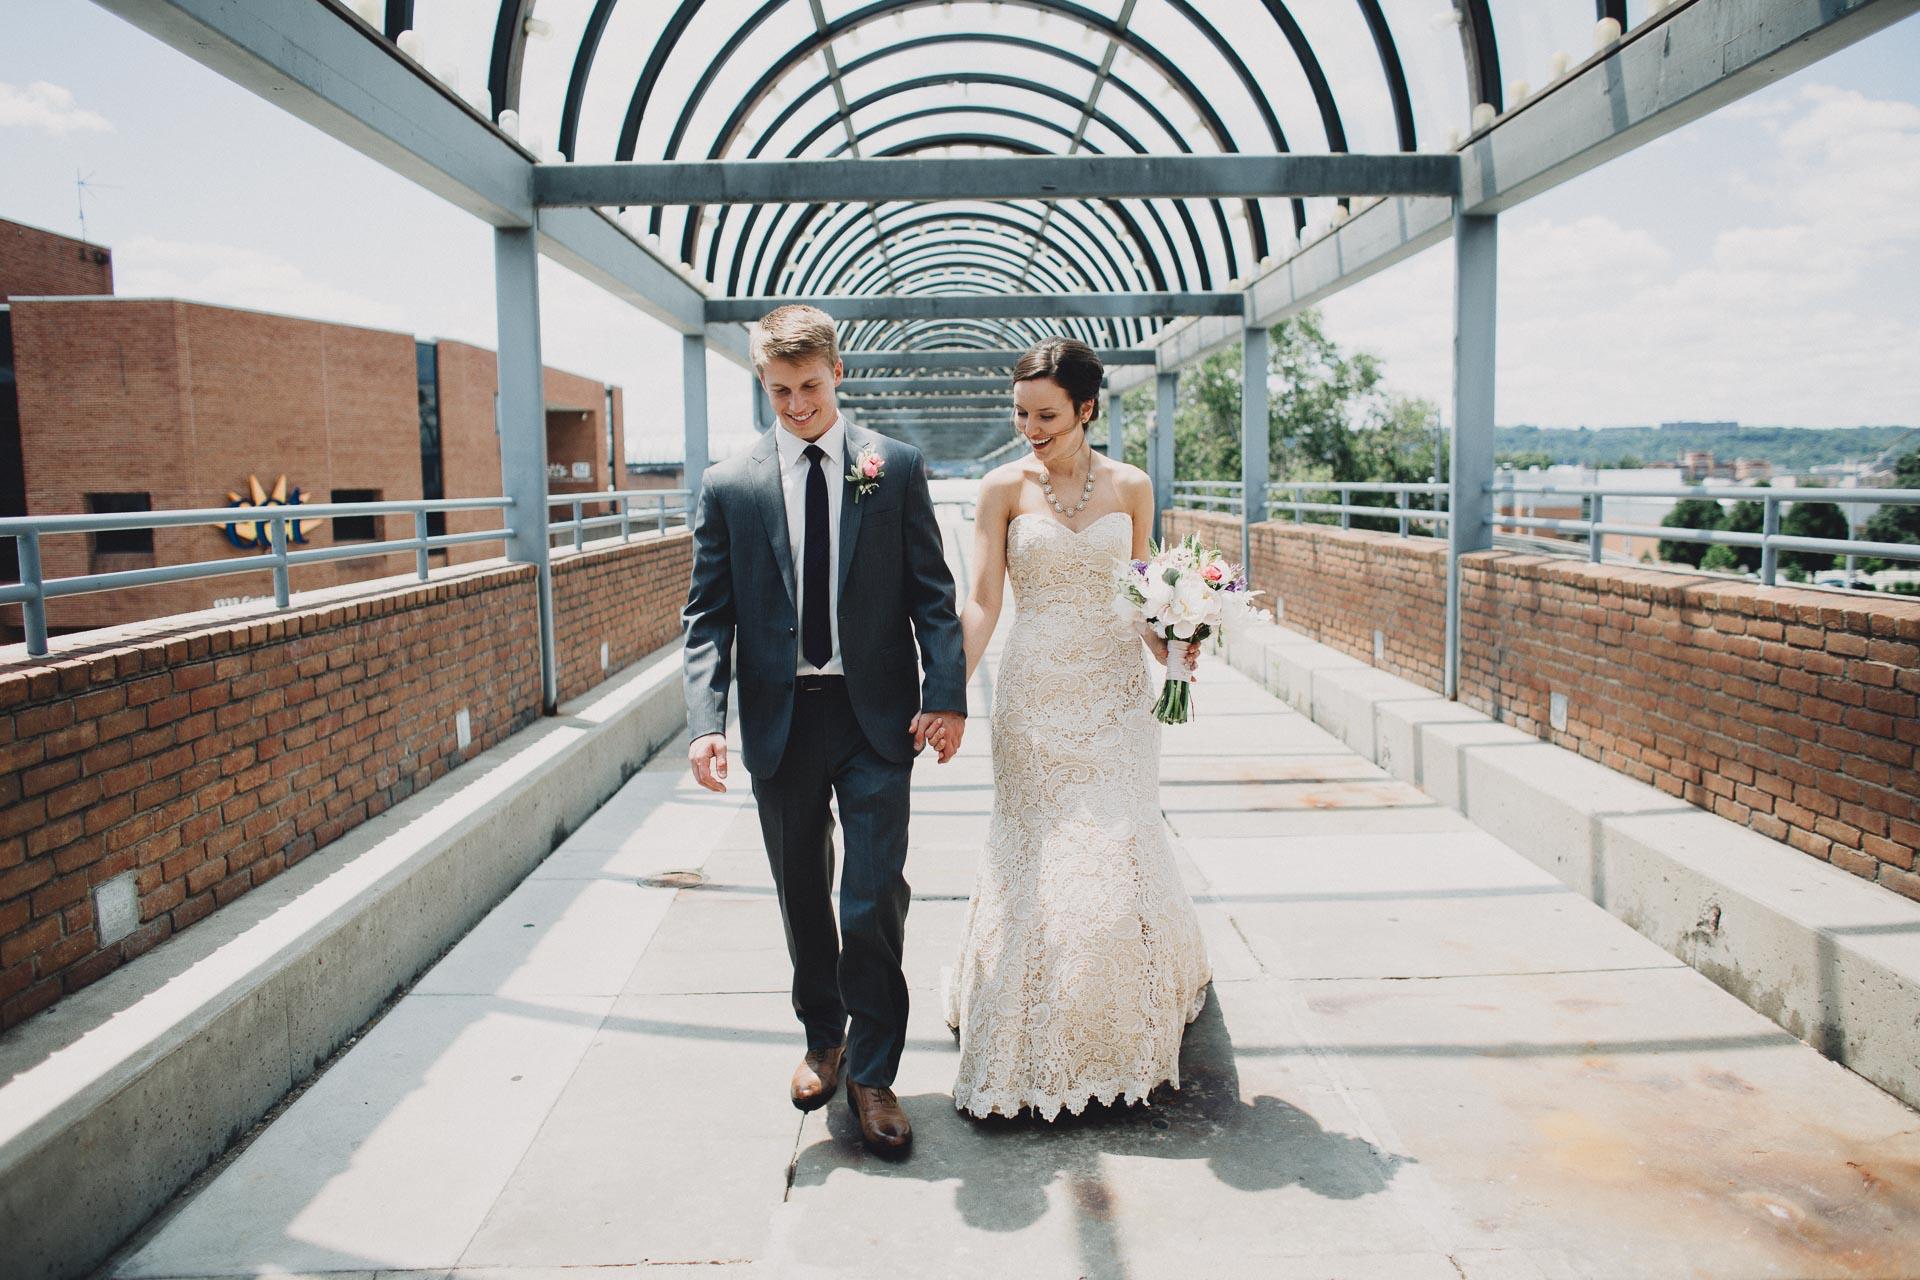 Julia-Michael-Cincinnati-Music-Hall-Wedding-061@2x.jpg